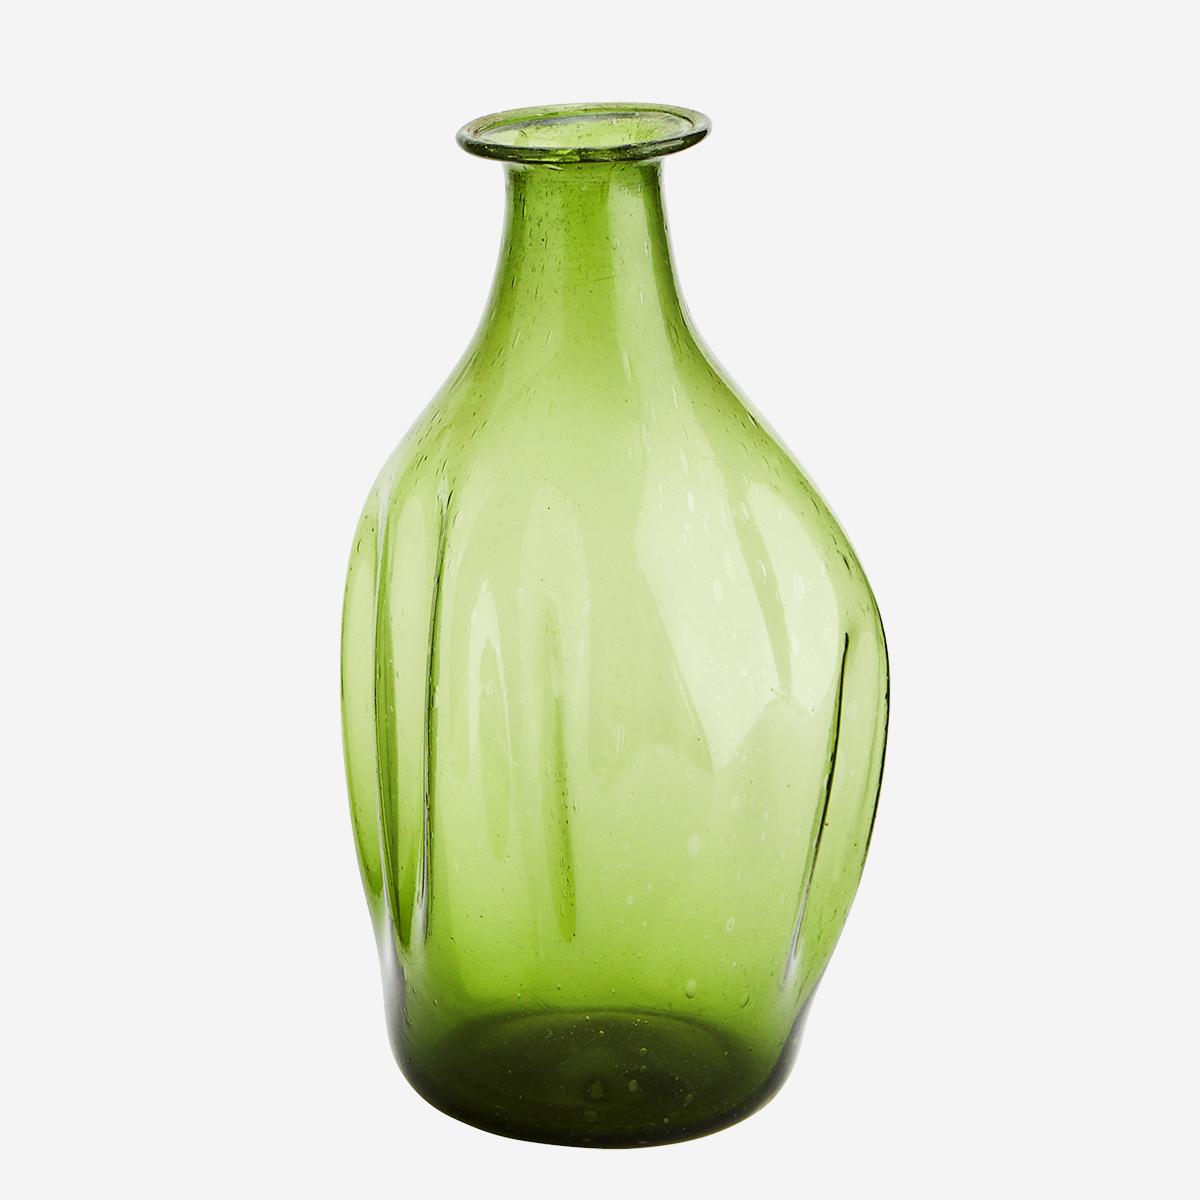 Recycled Glass Vase by Madam Stoltz